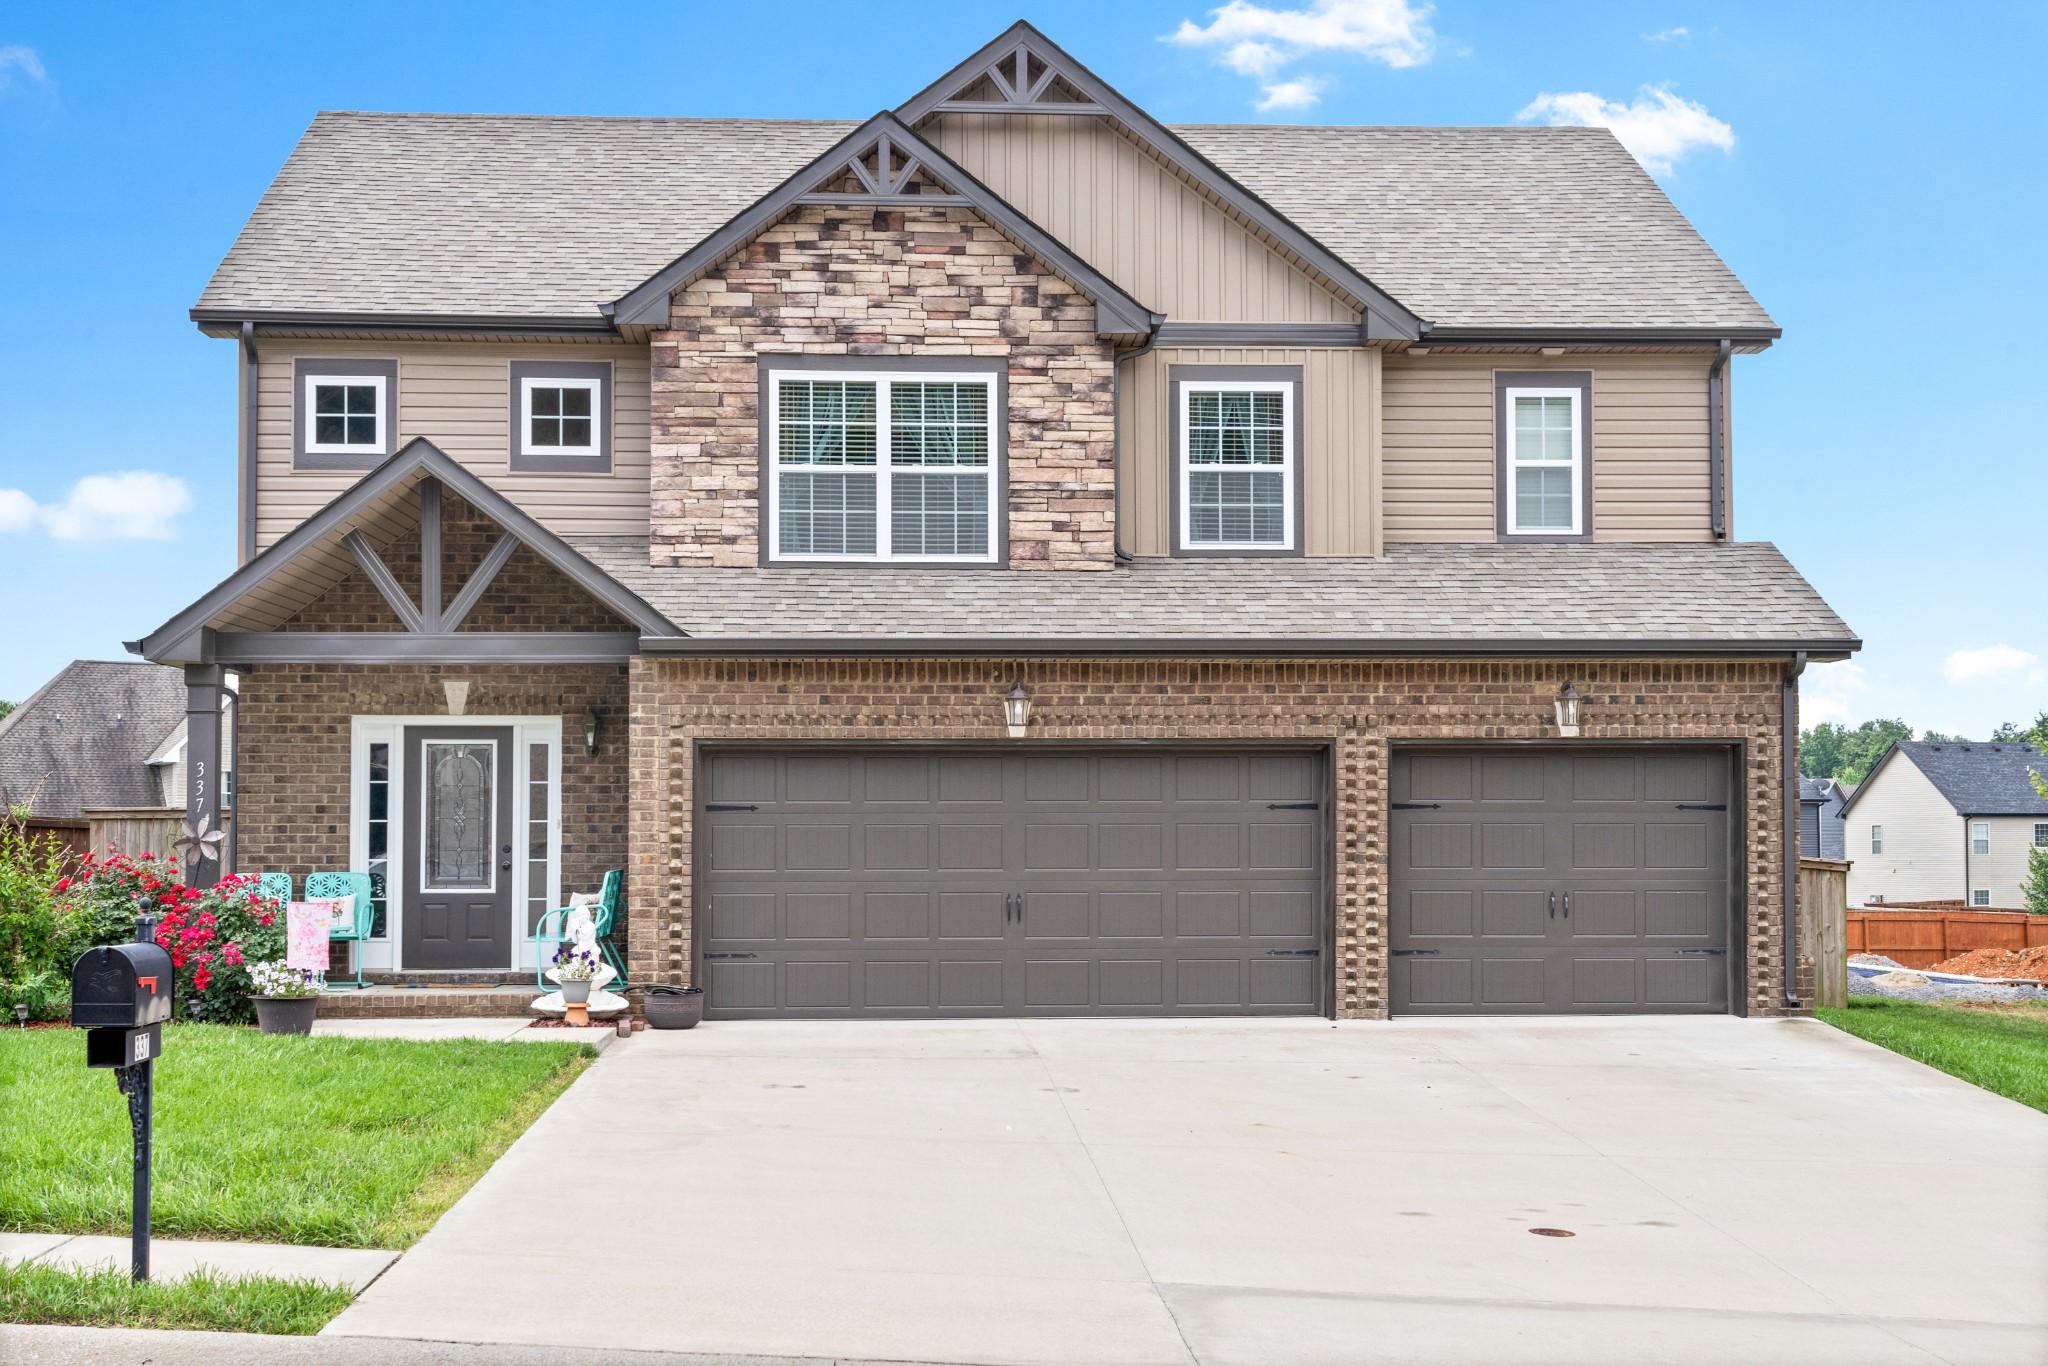 337 Abeline Dr Property Photo - Clarksville, TN real estate listing